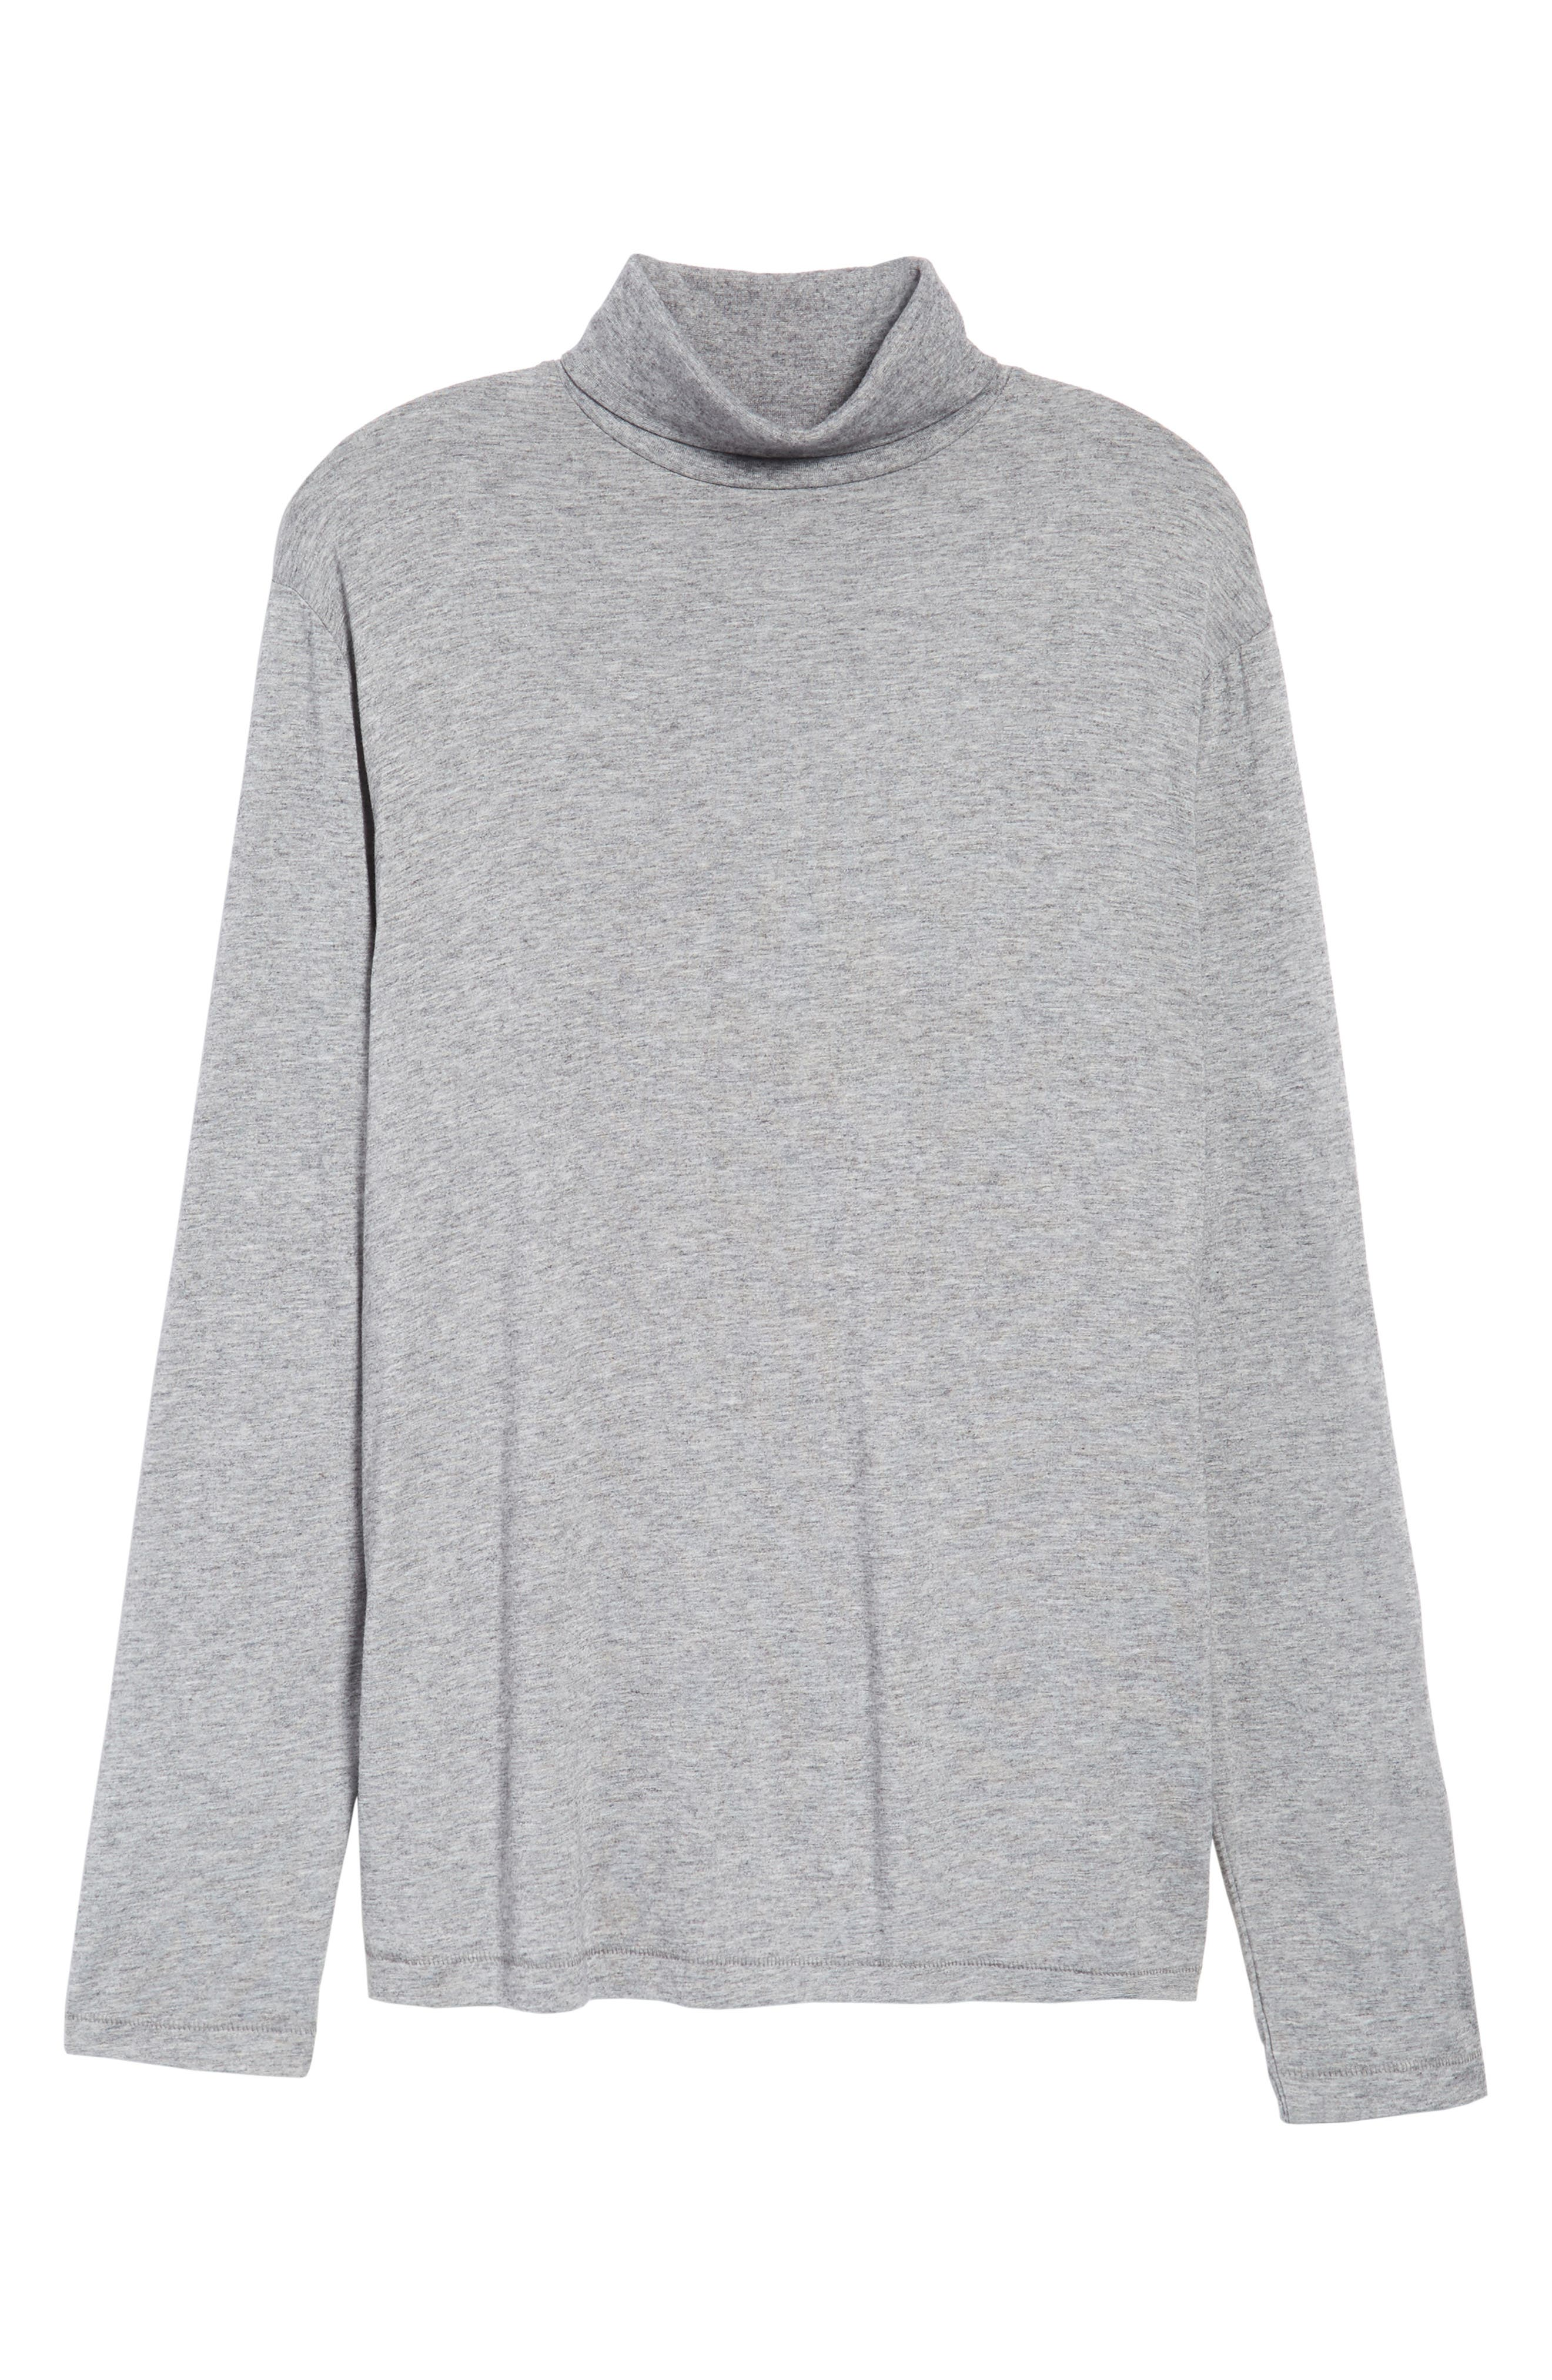 Lightweight Turtleneck Sweater,                             Alternate thumbnail 6, color,